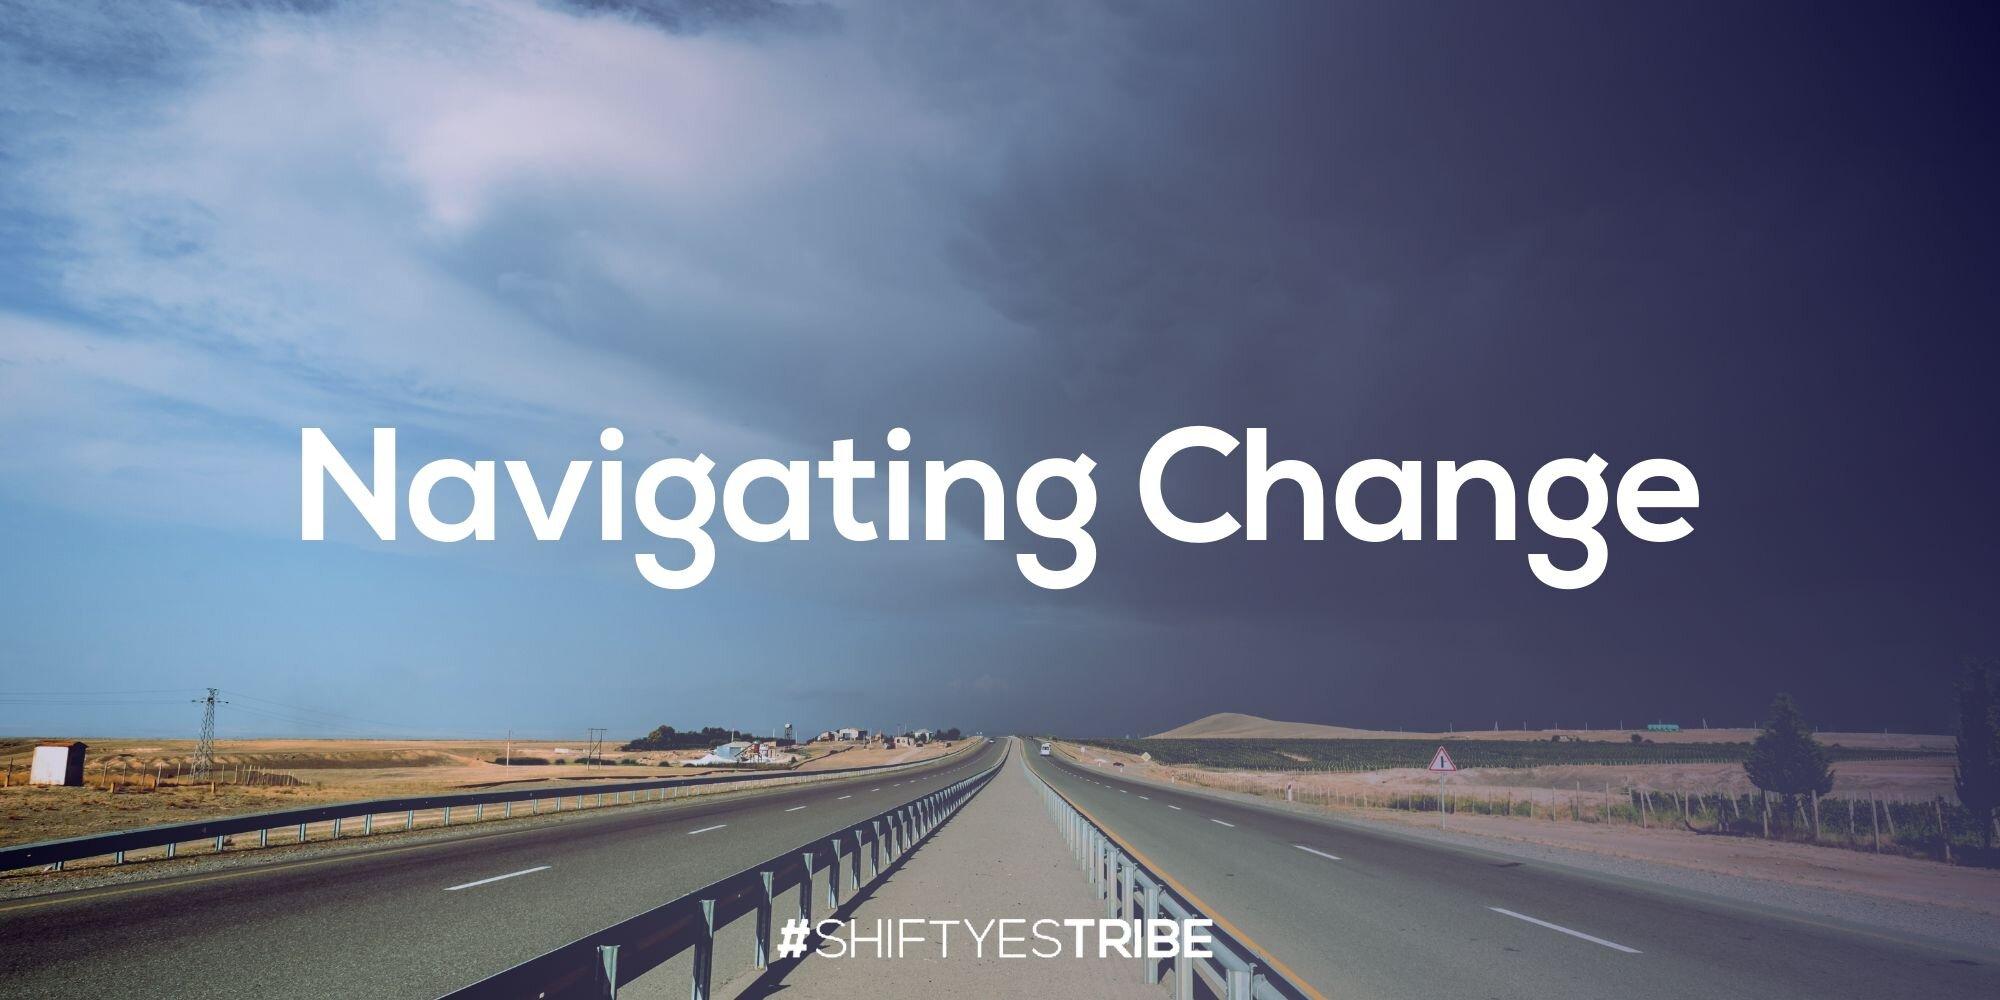 Galen Emanuele #shiftyestribe Shift Yes Tribe Navigating Change May 2019.jpg